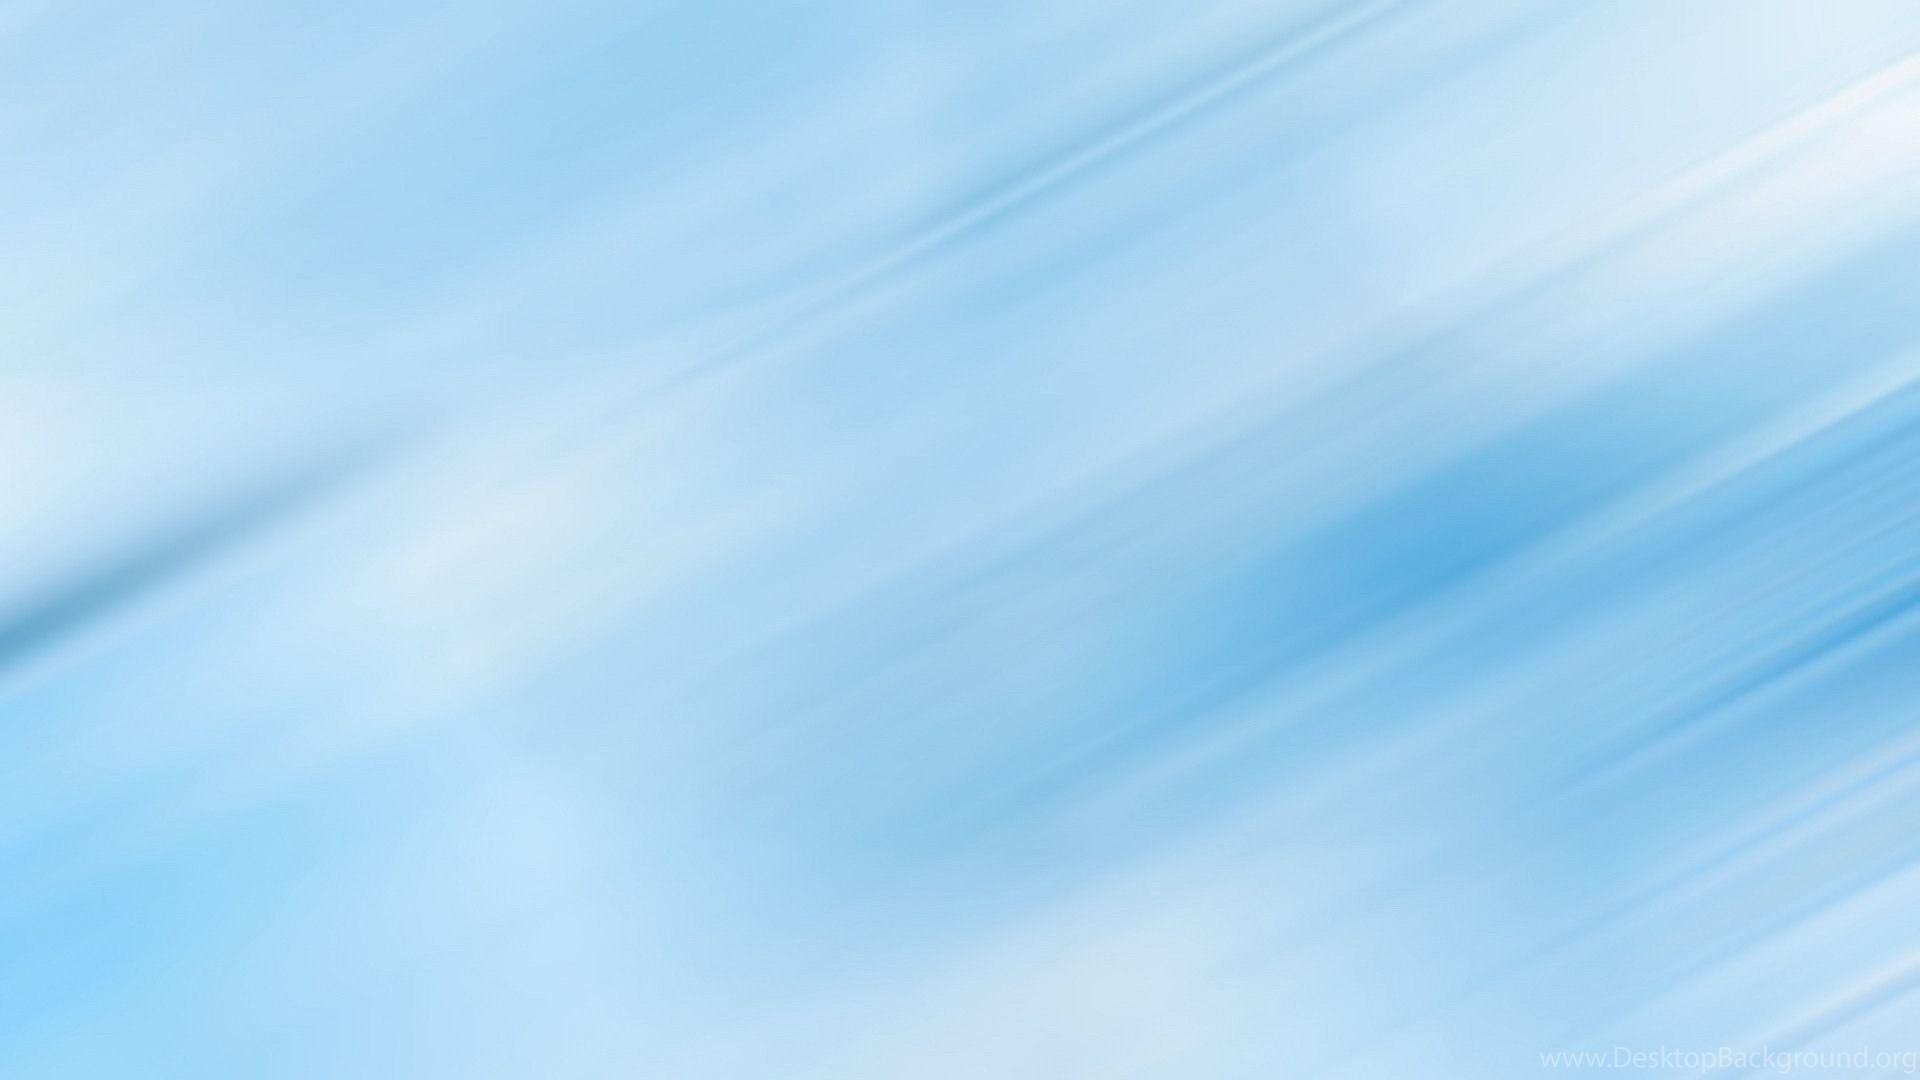 Sky Blue Backgrounds Wallpapers Cave Desktop Background